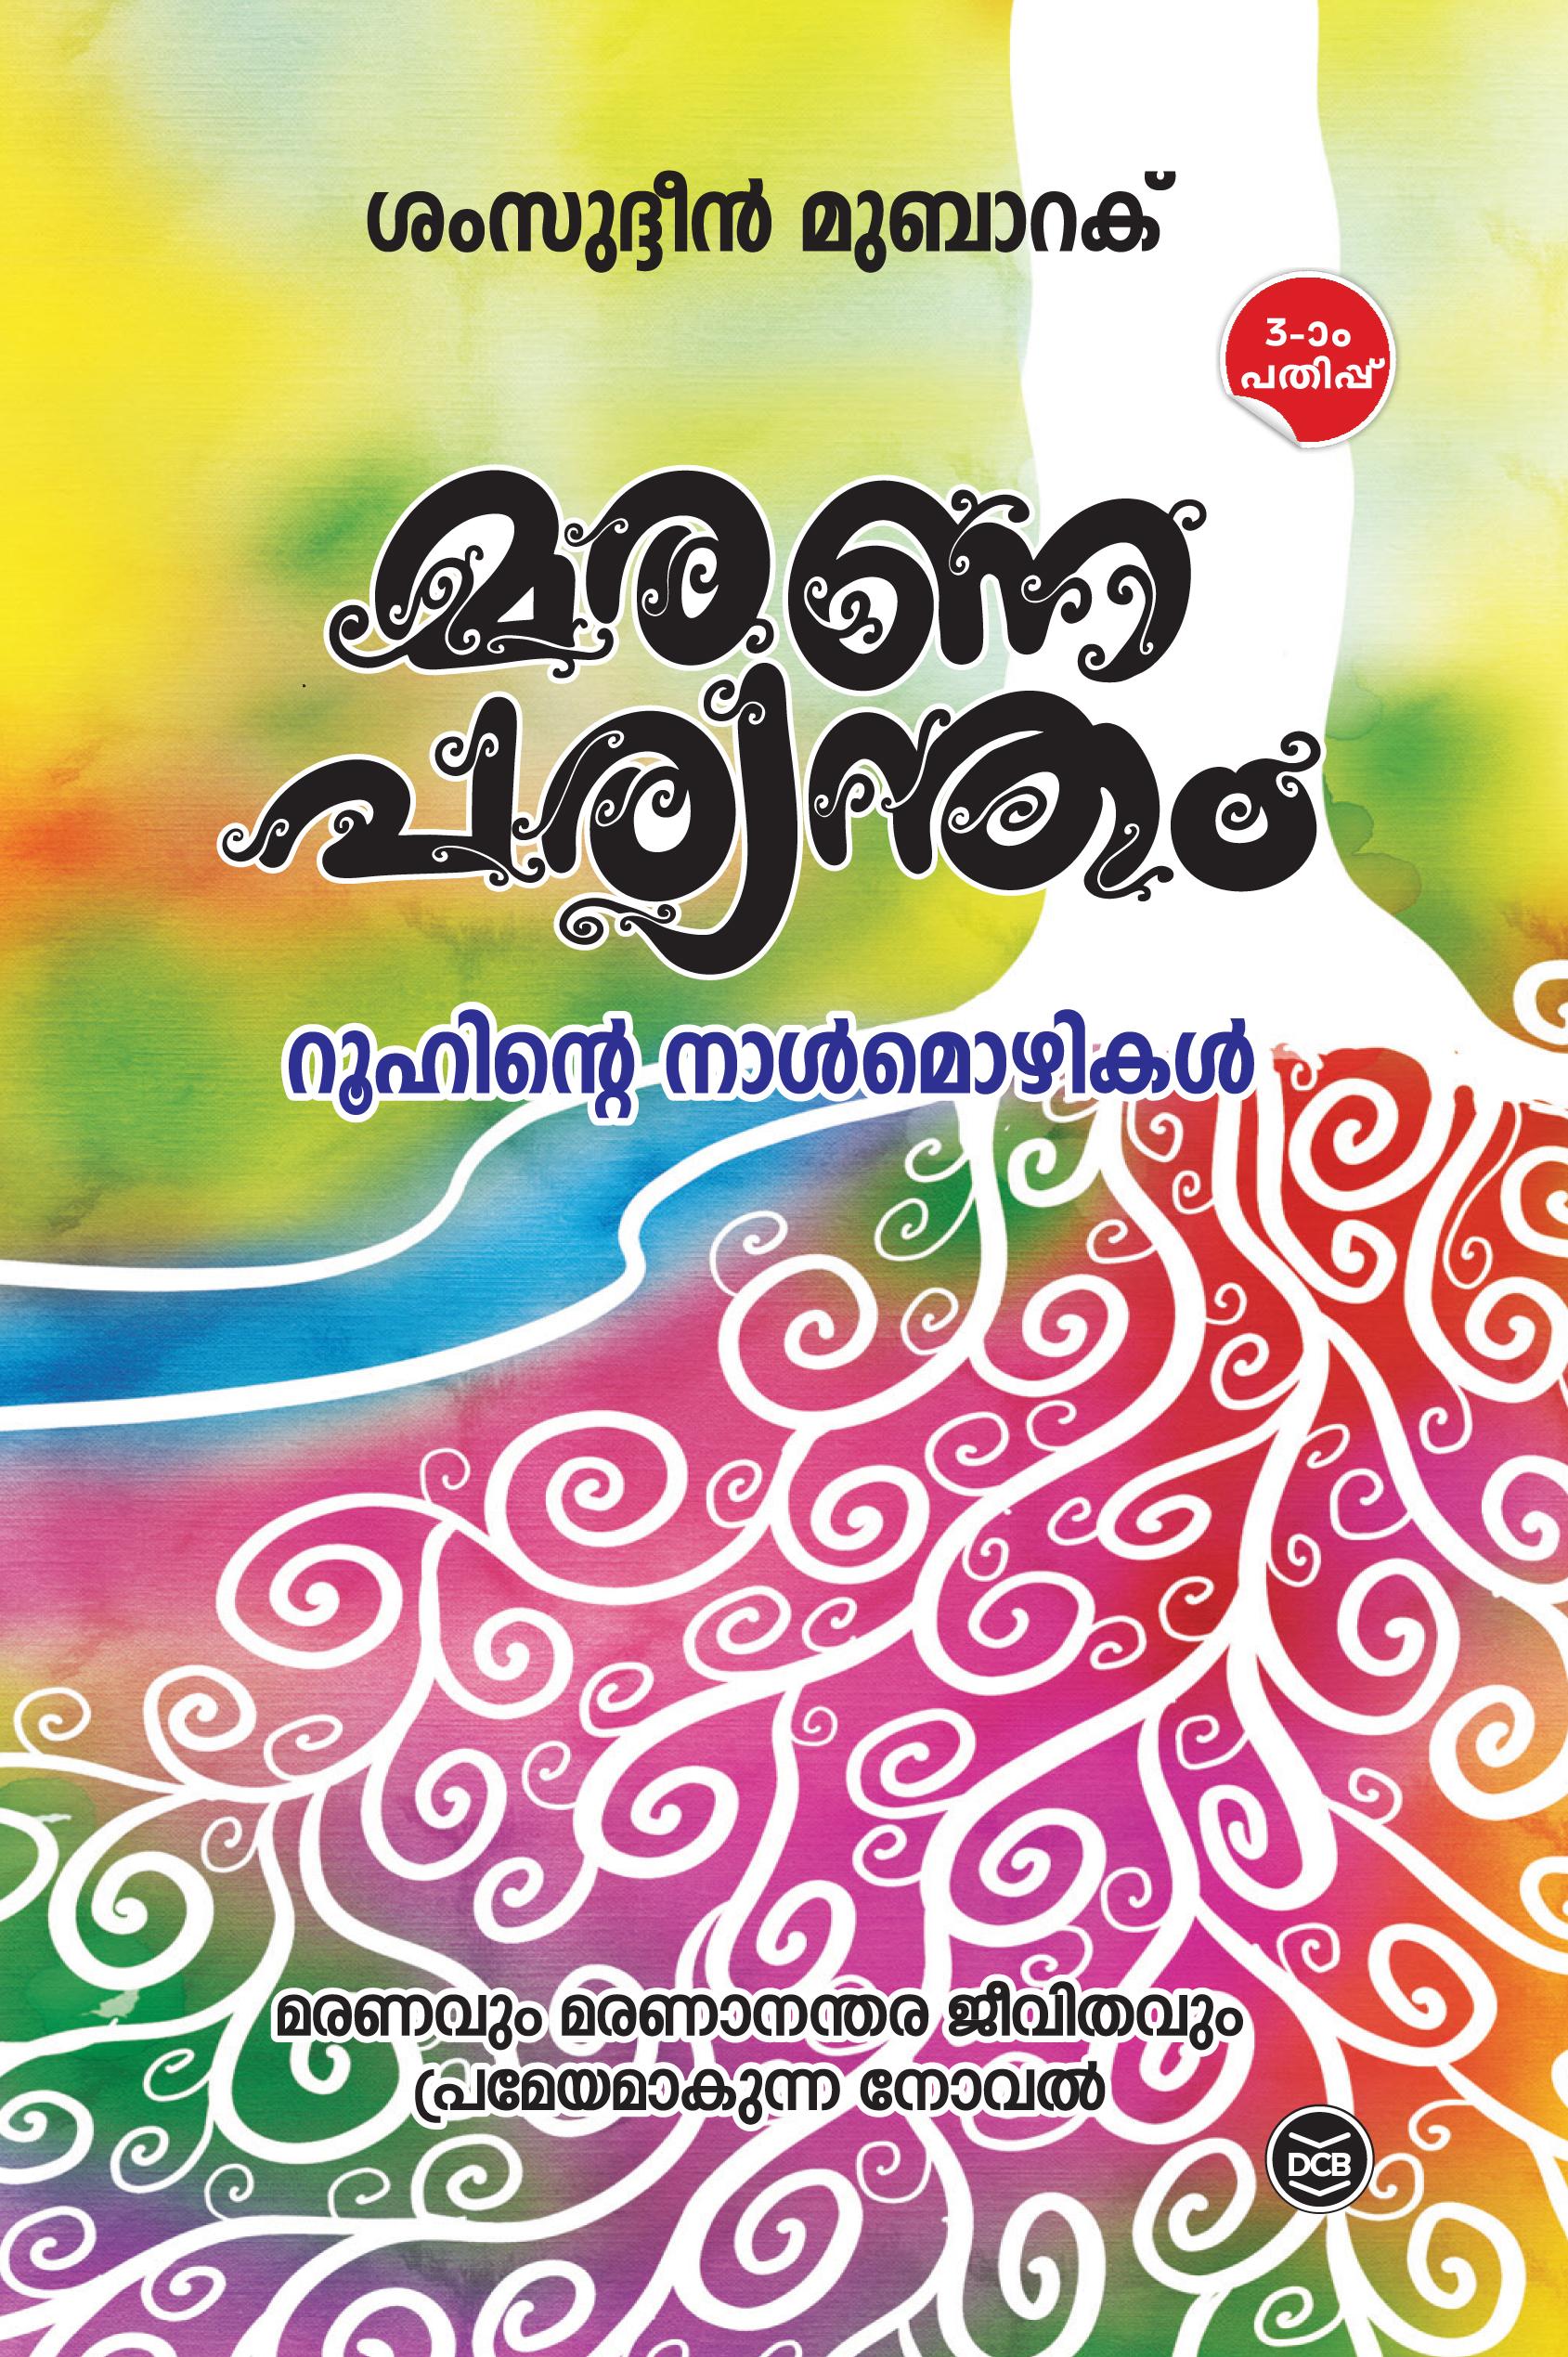 MARANAPAYYANTHAM ED-3 COVER